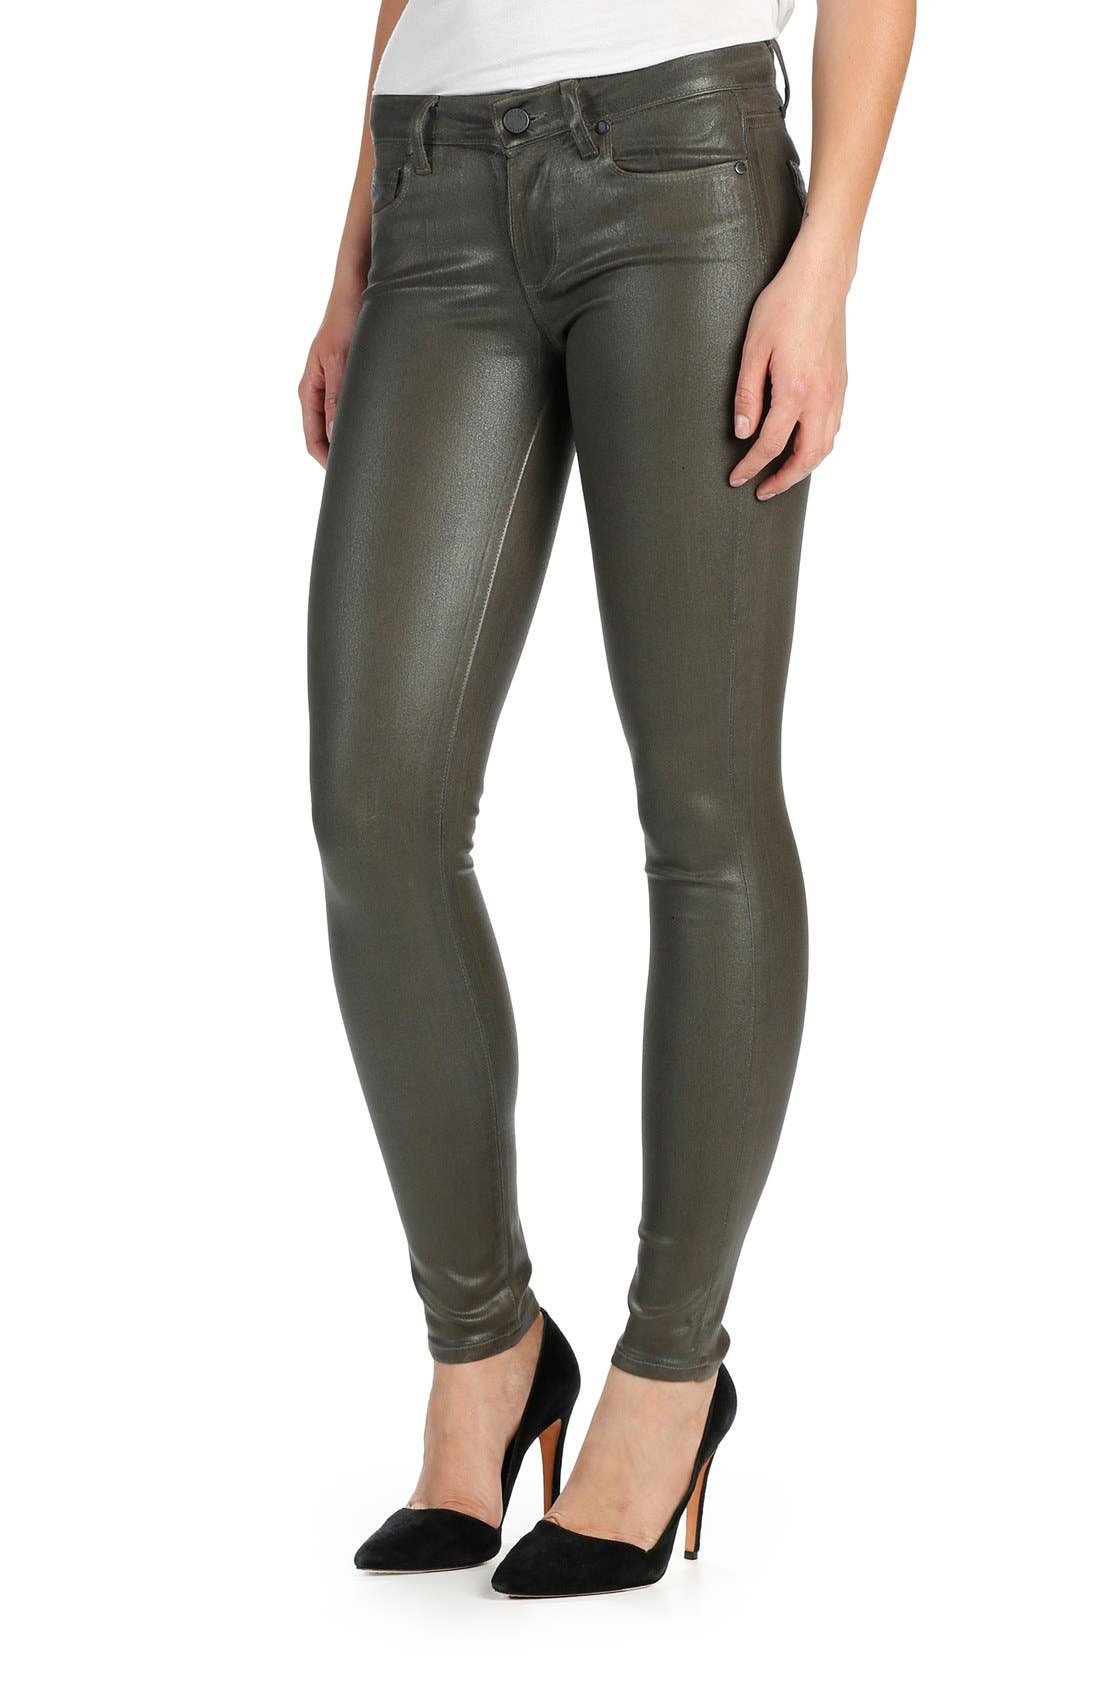 Transcend Verdugo Coated Ultra Skinny Jeans,                         Main,                         color, 300